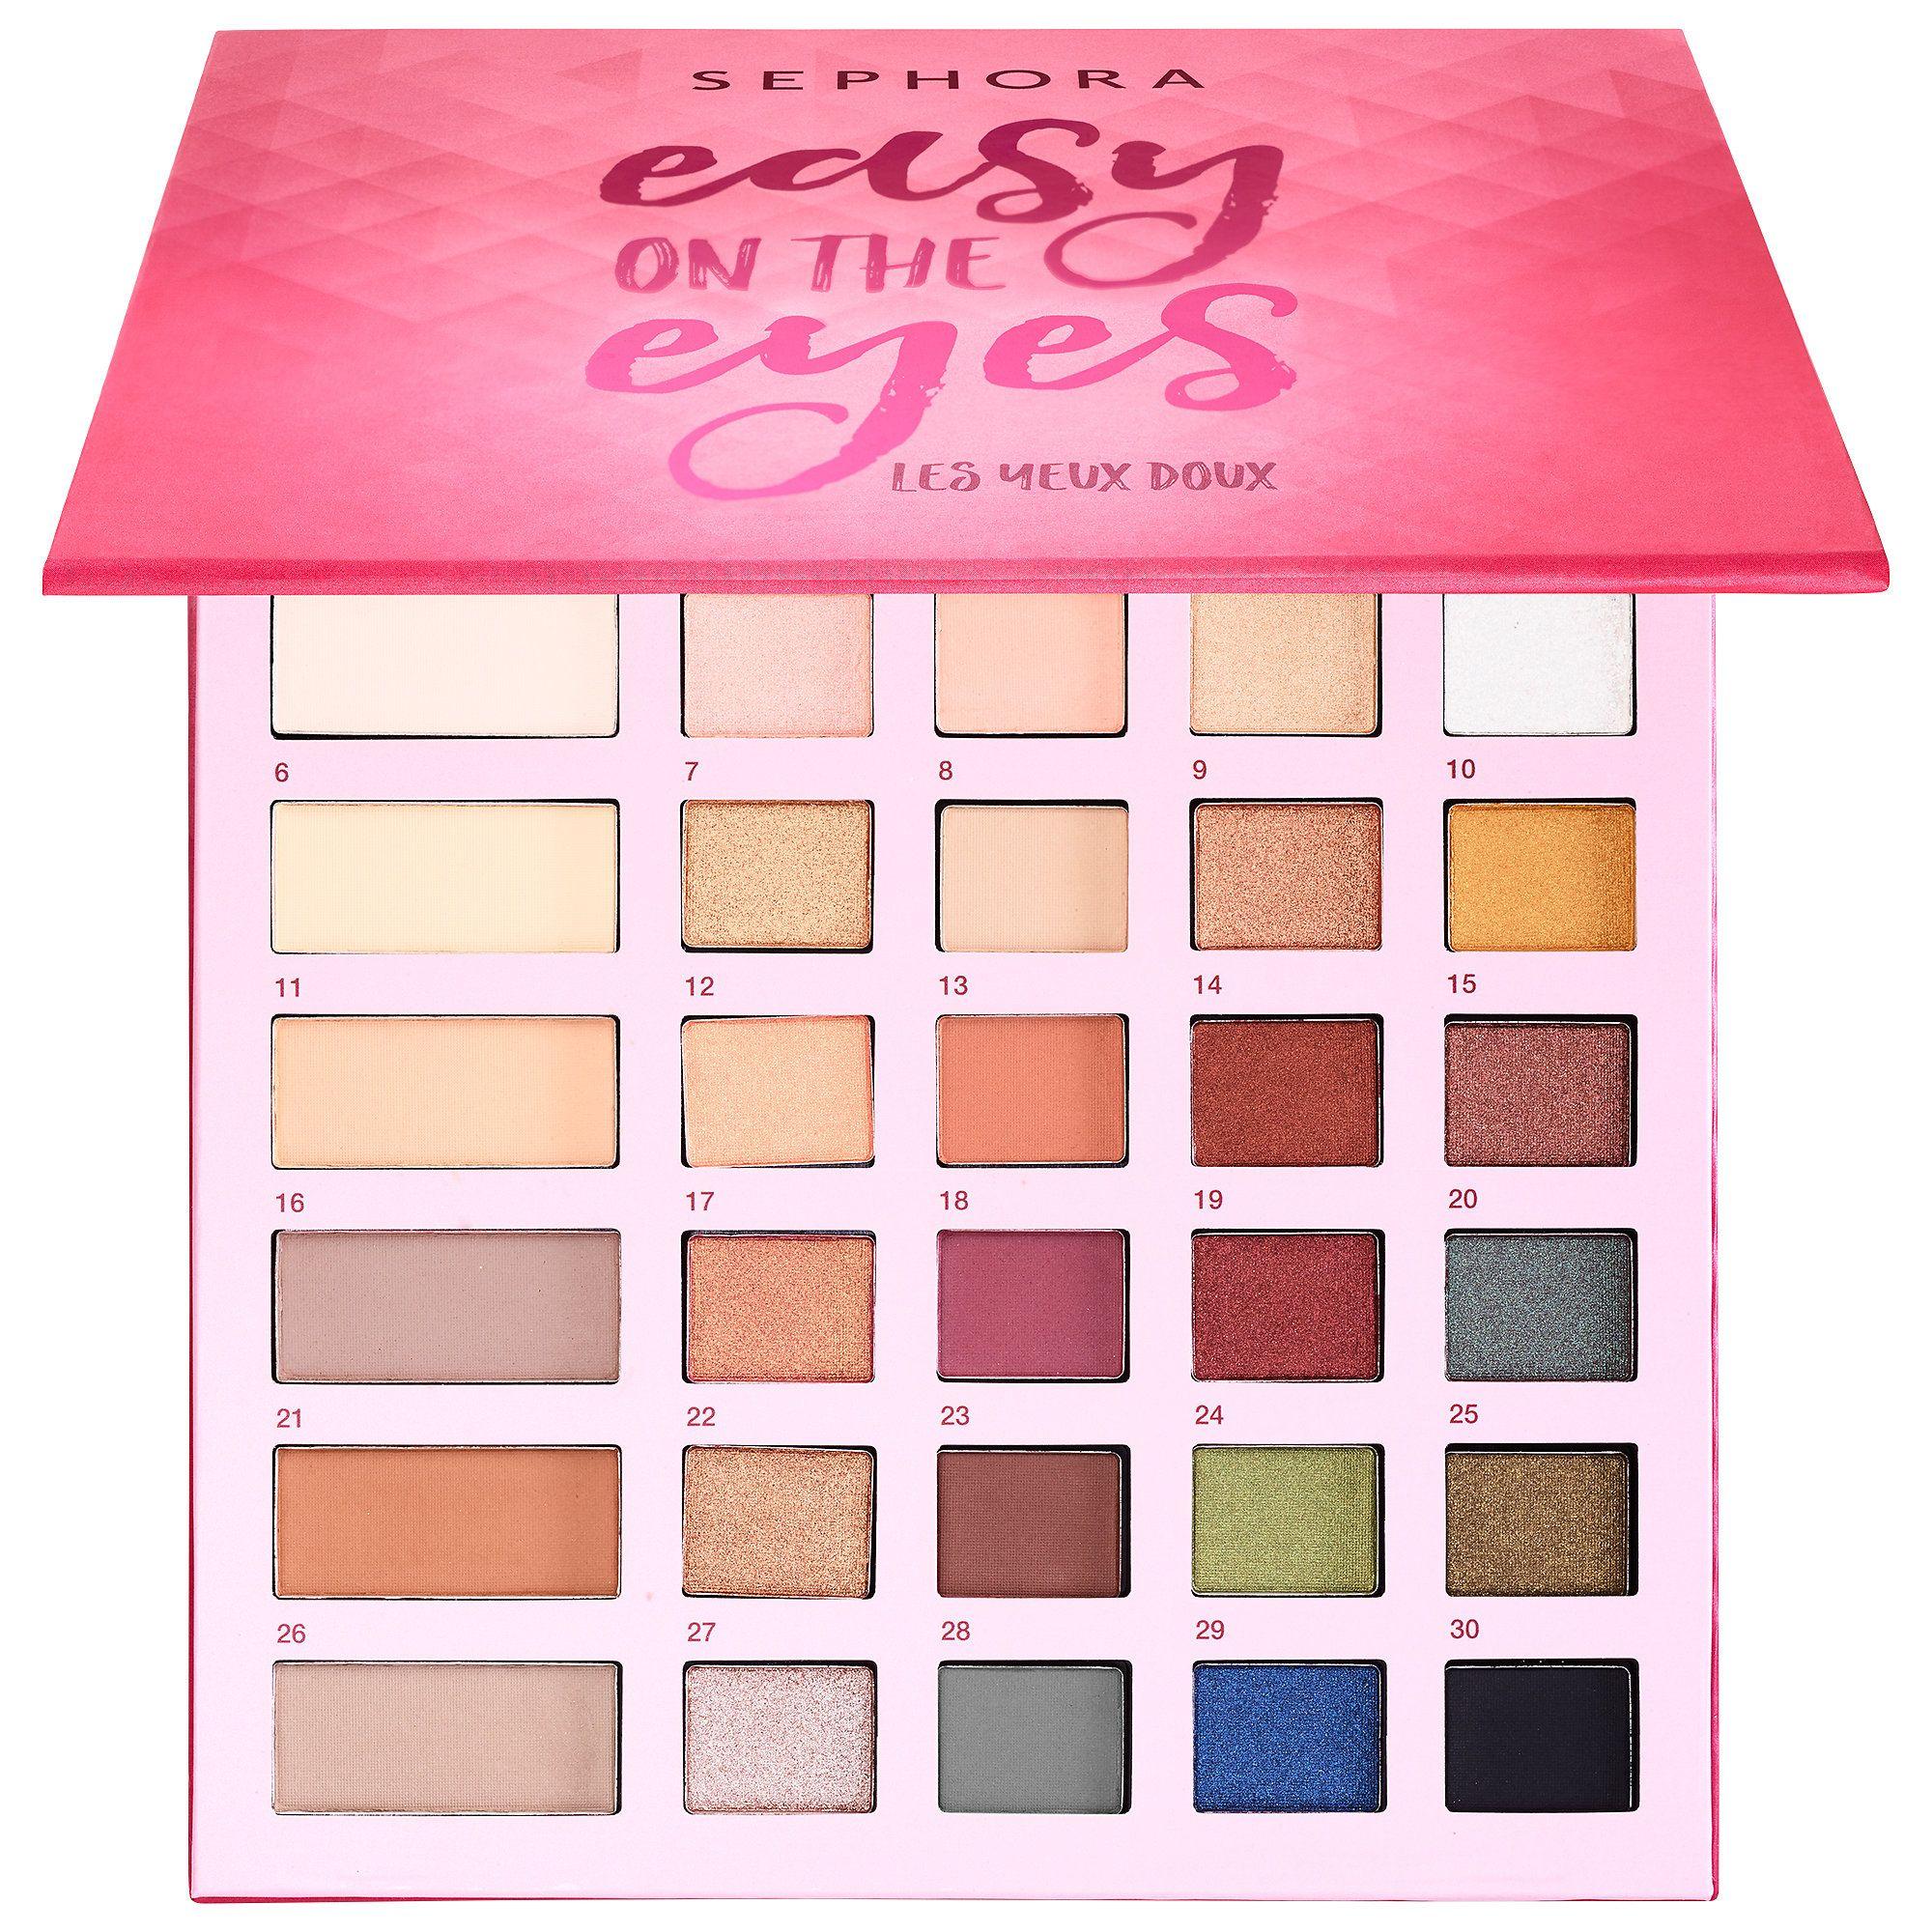 20 Best Eye Makeup Palettes - Prettiest Eyeshadow Palettes